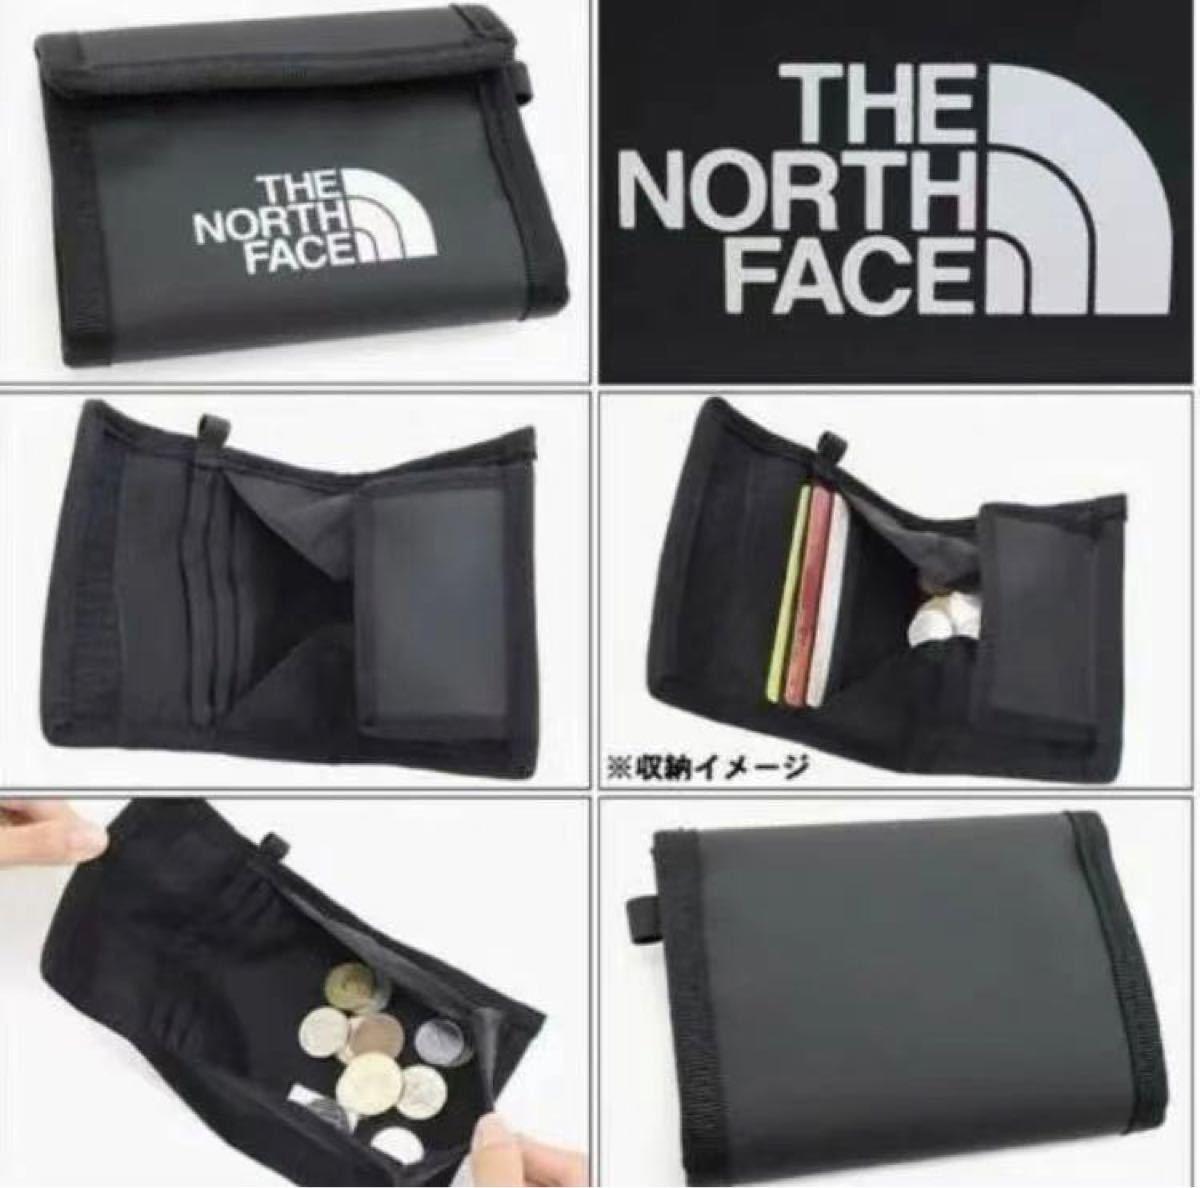 THE NORTH FACE ザ ノースフェイスコインケース